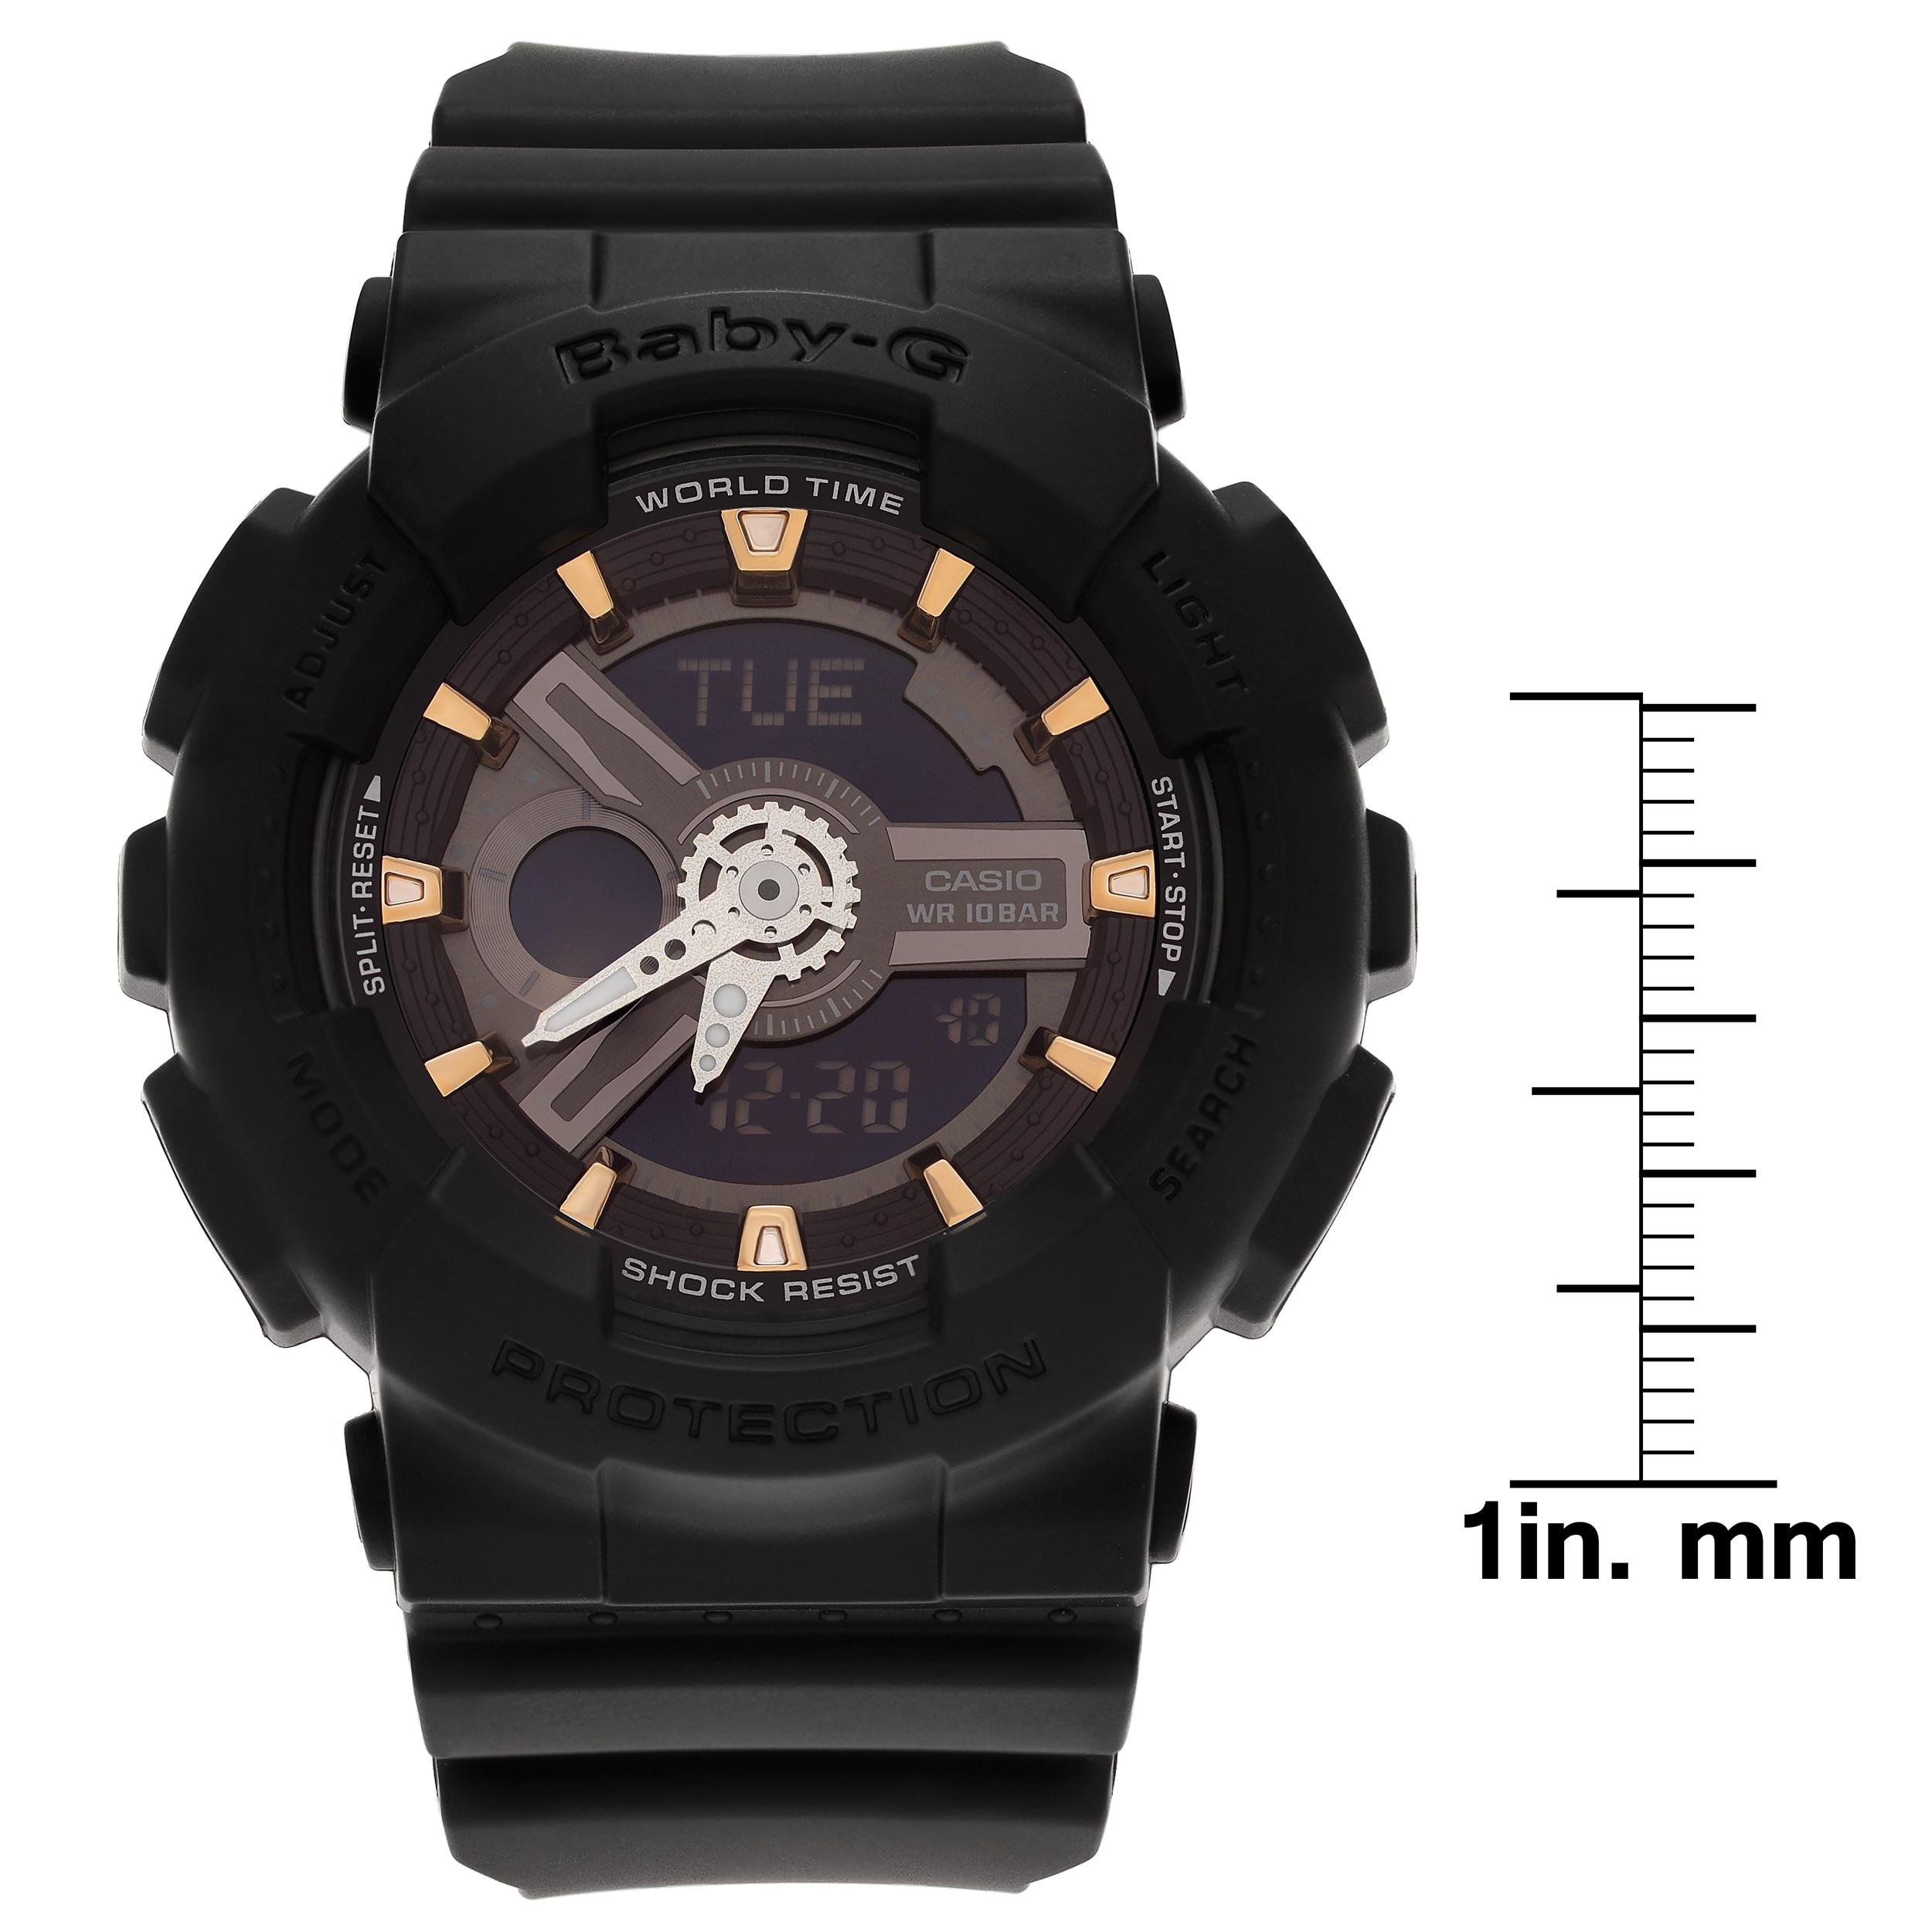 51bed8301f66 Casio Women s BA110GA-1A  Baby-G  Black Analog Digital Dial Resin Strap  Watch